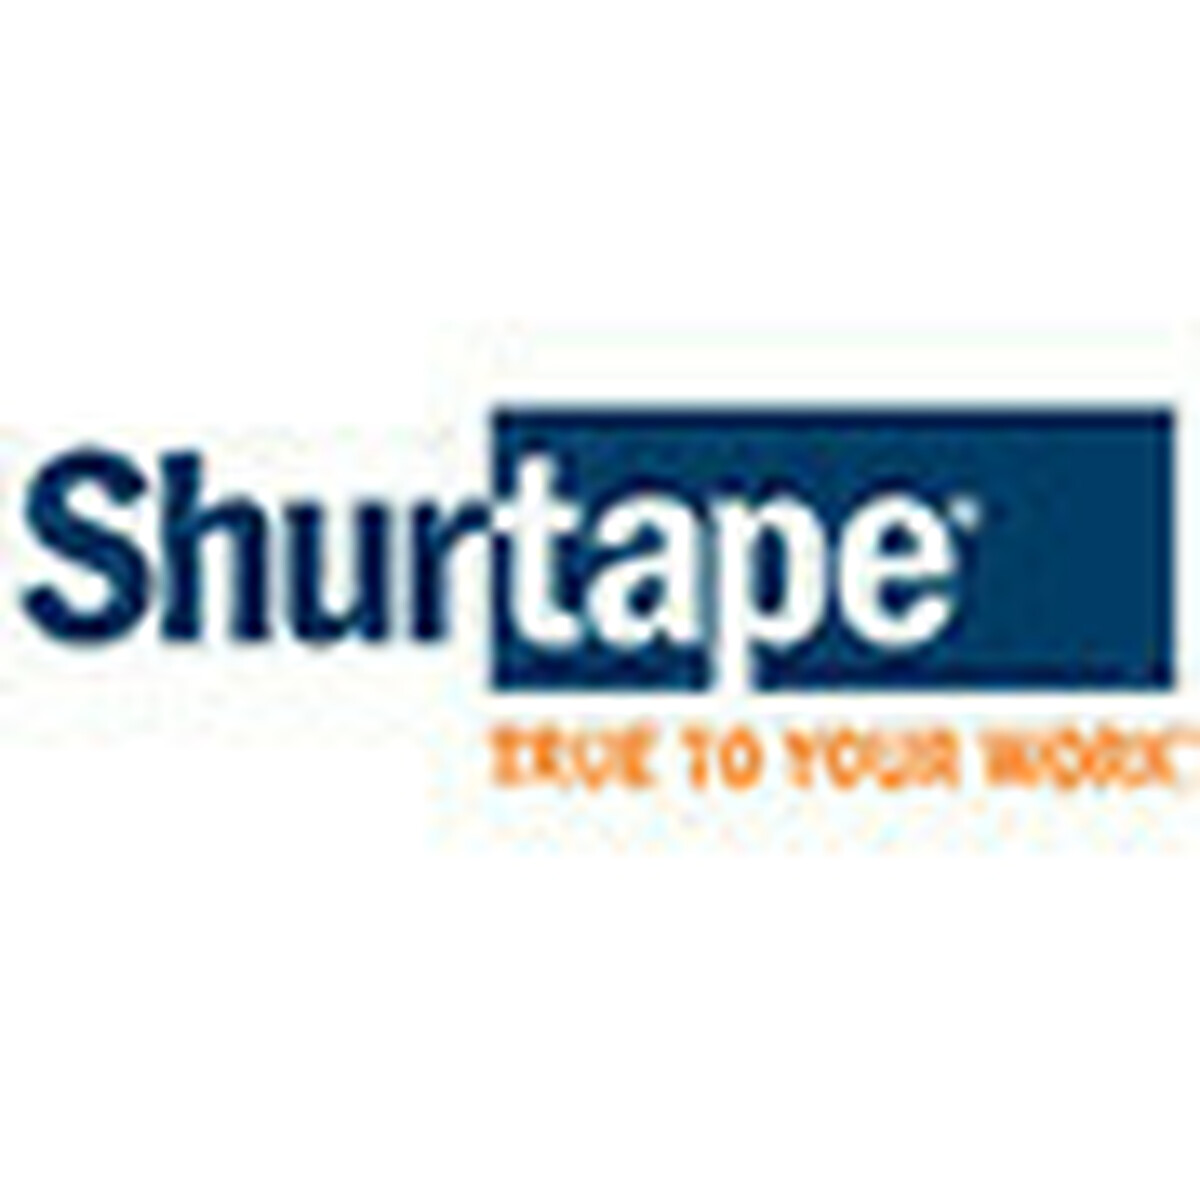 Shurtape Duct Tape